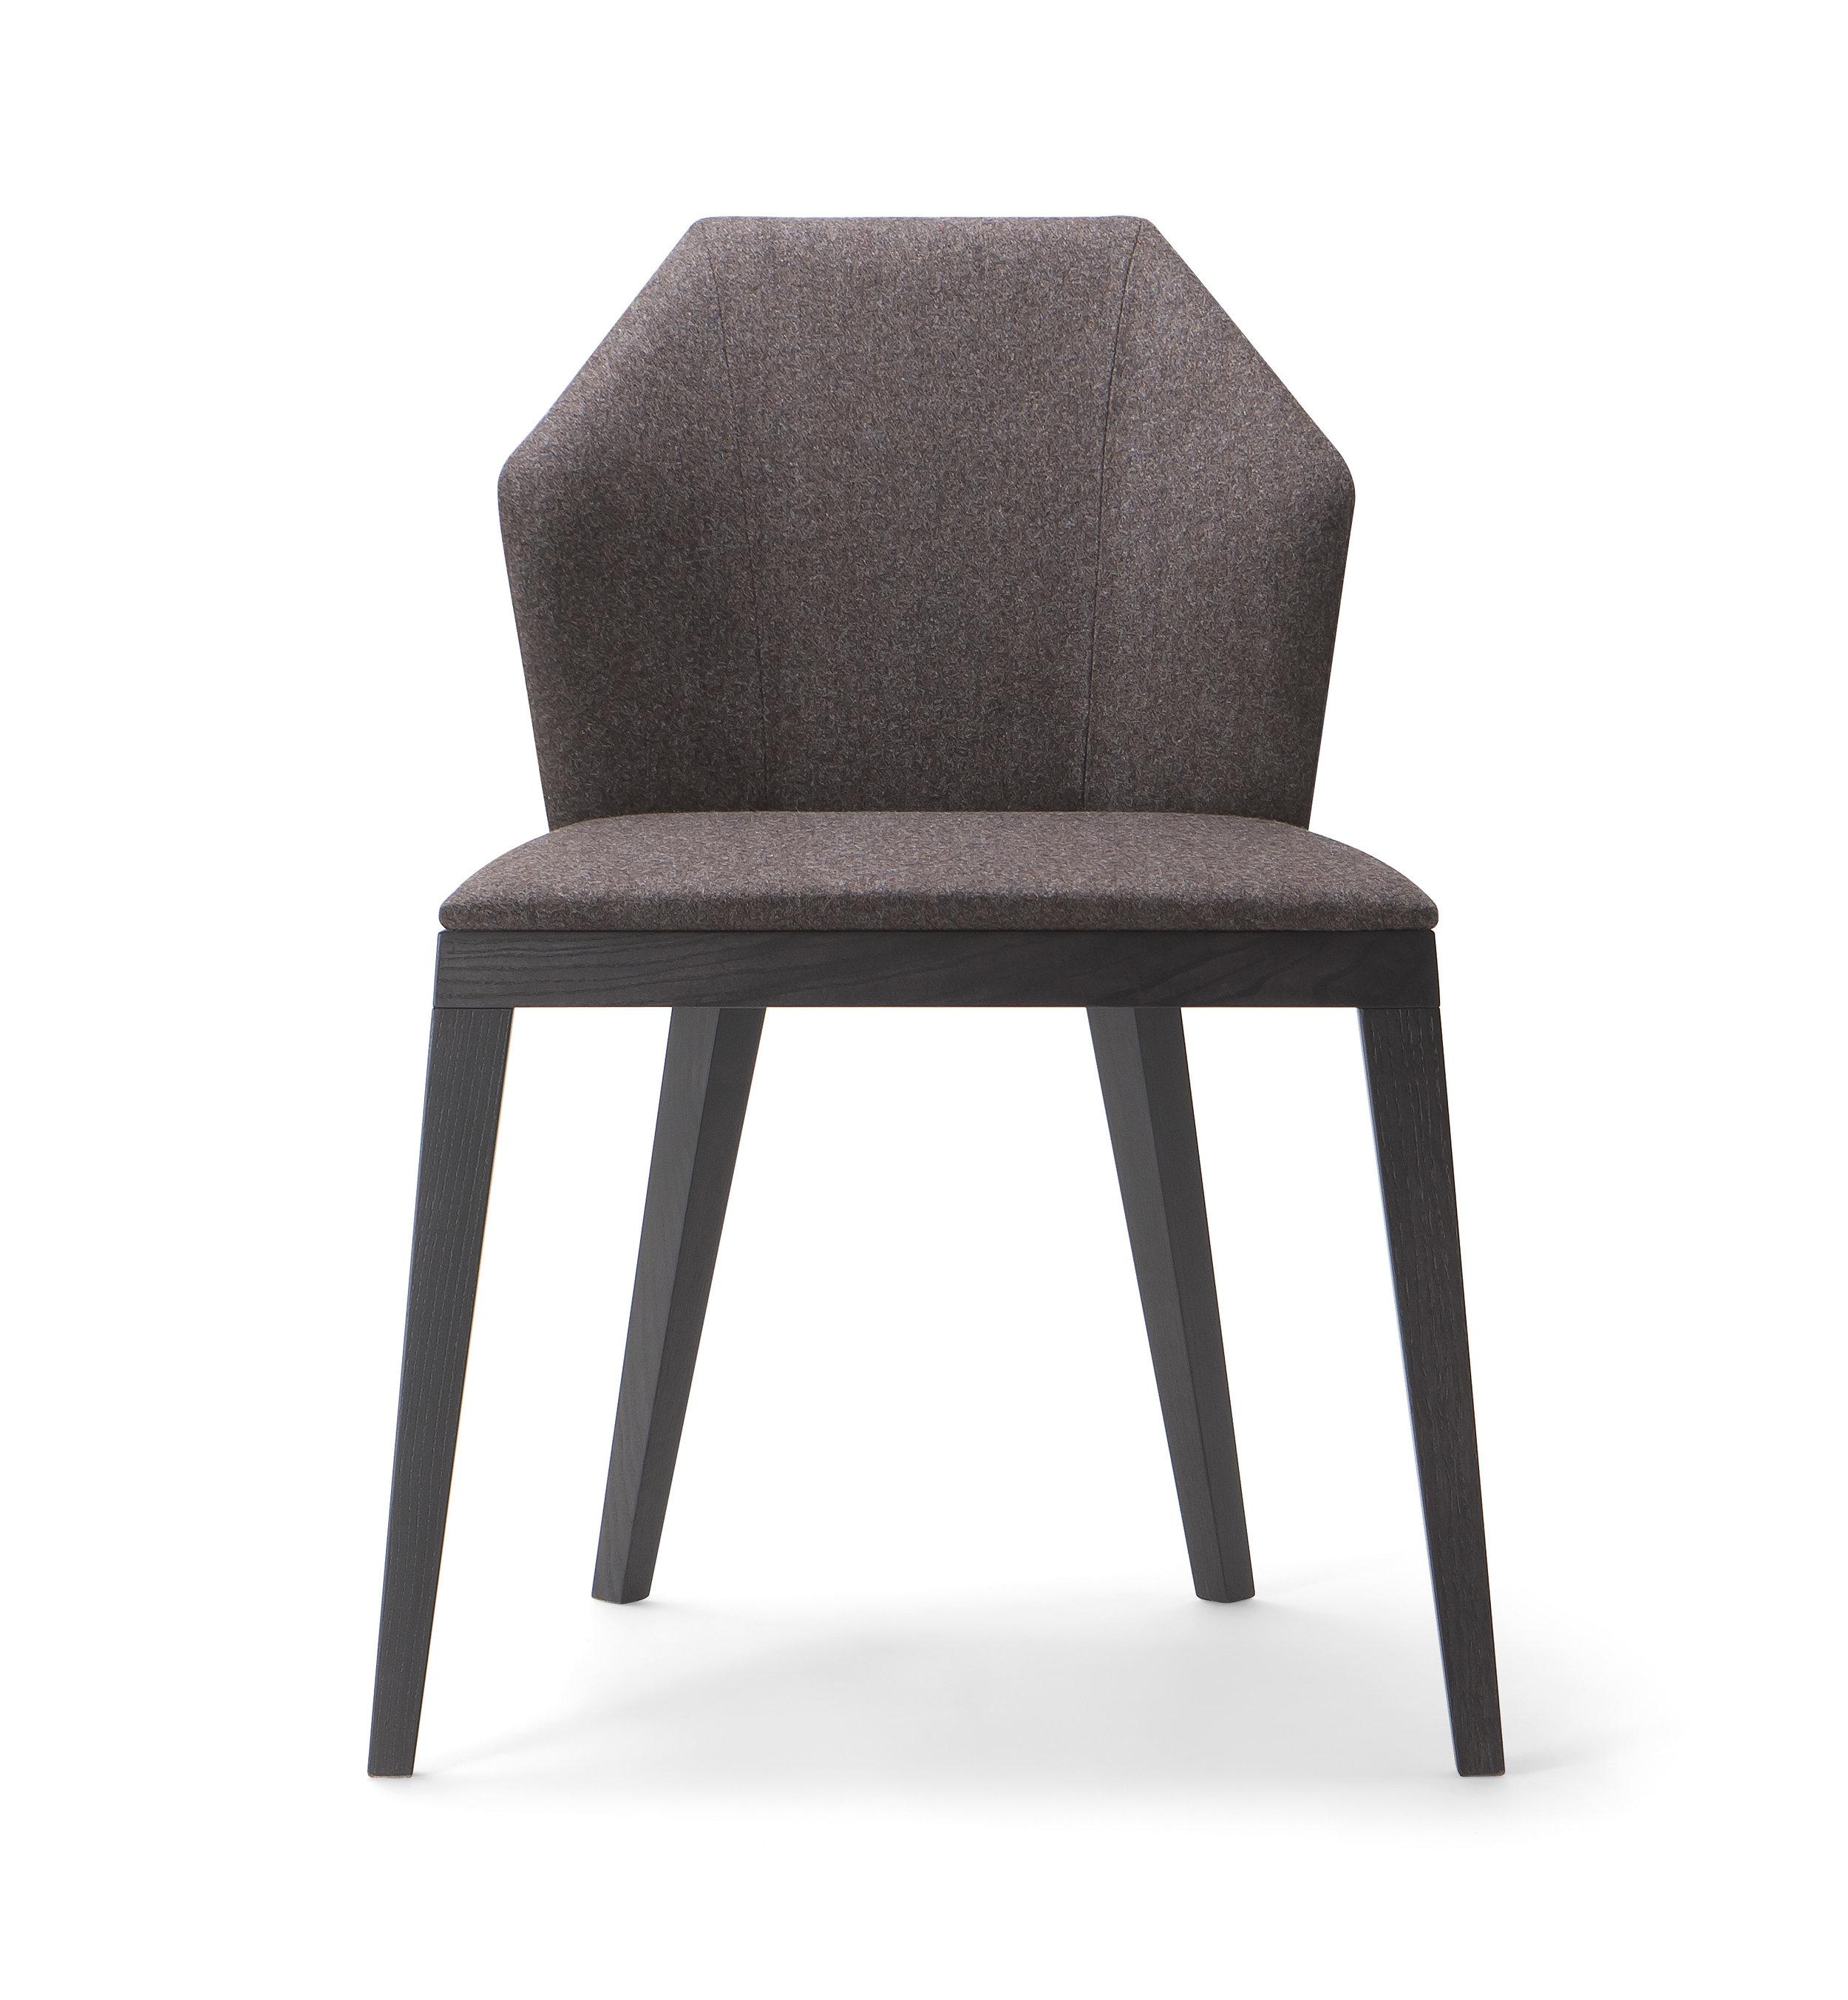 Rock Chair - Verti SRL